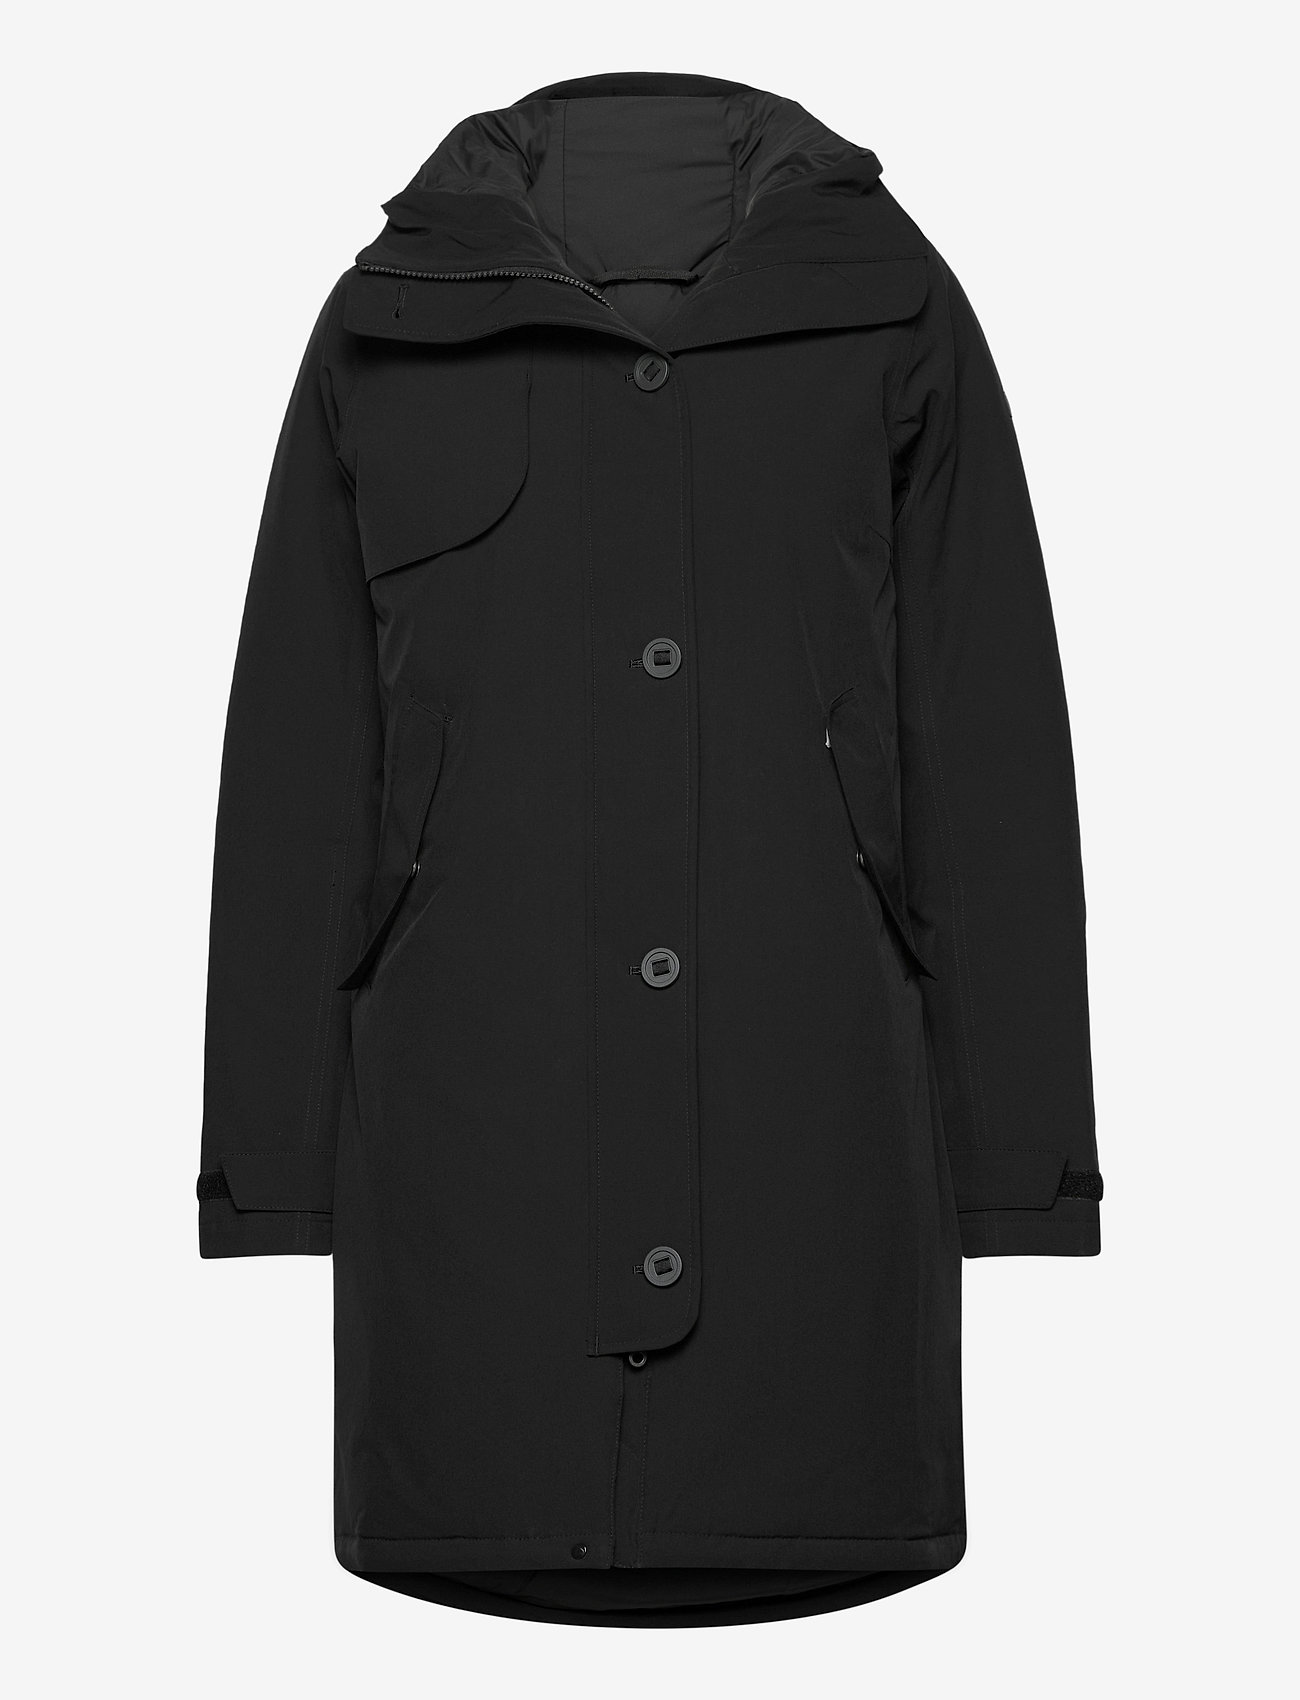 Bergans - Oslo Down W Parka - down jackets - black - 0